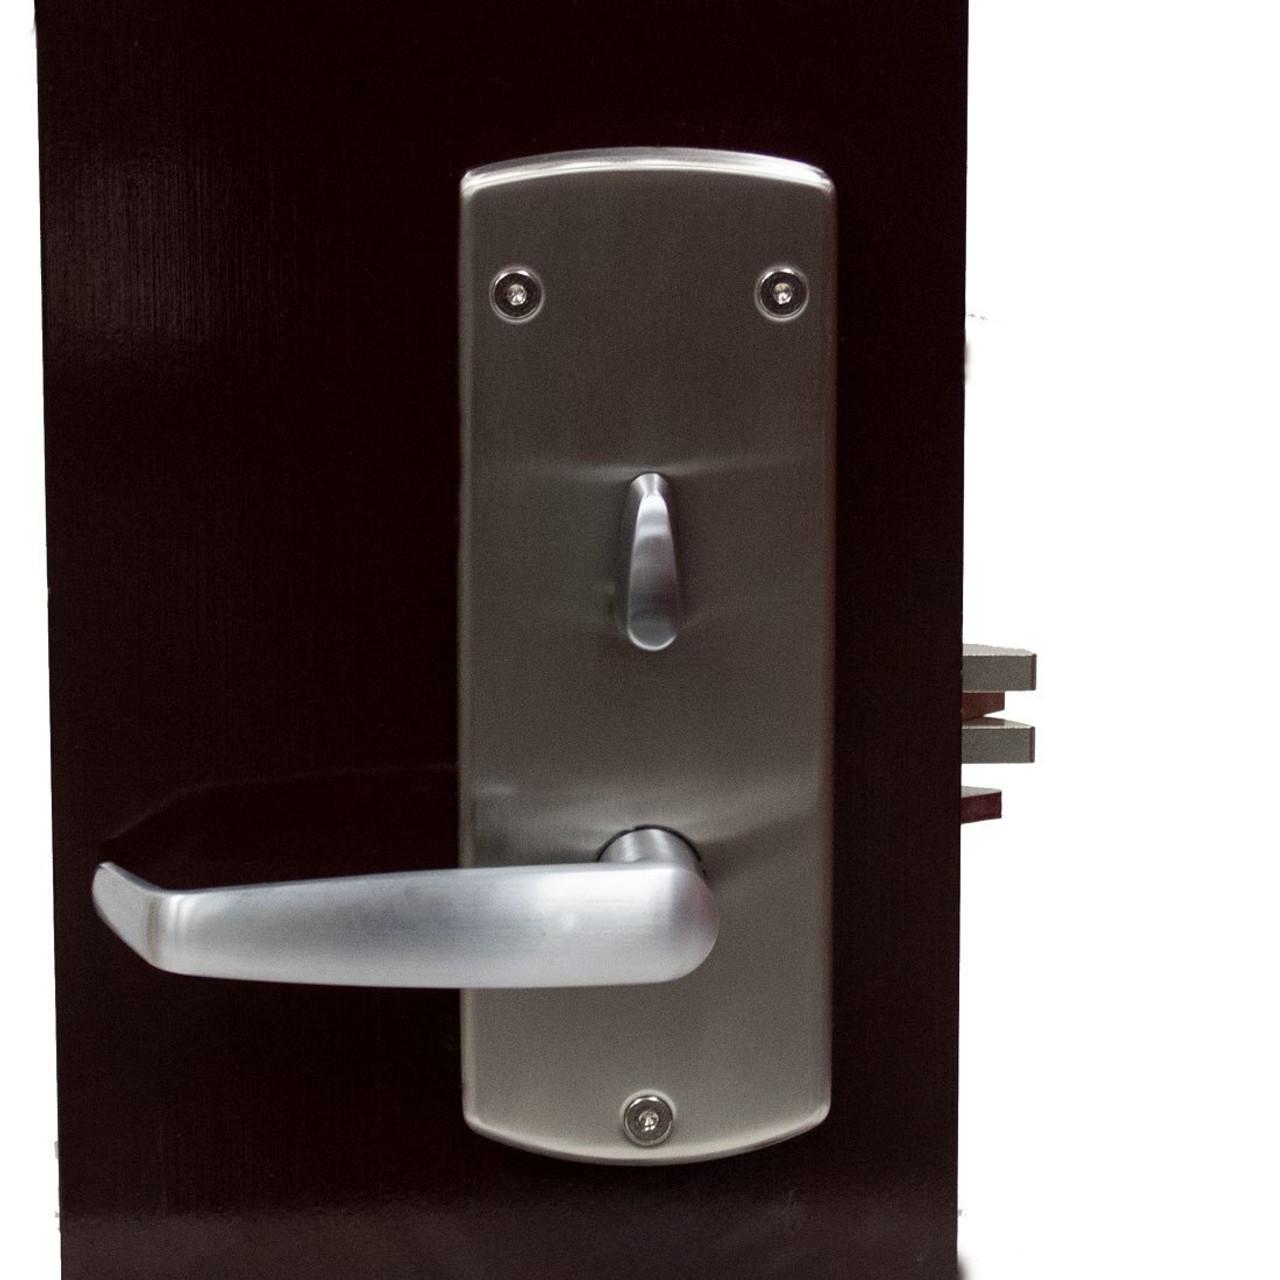 SAFLOK ILCO 790/RT BLUETOOTH DOOR LOCK